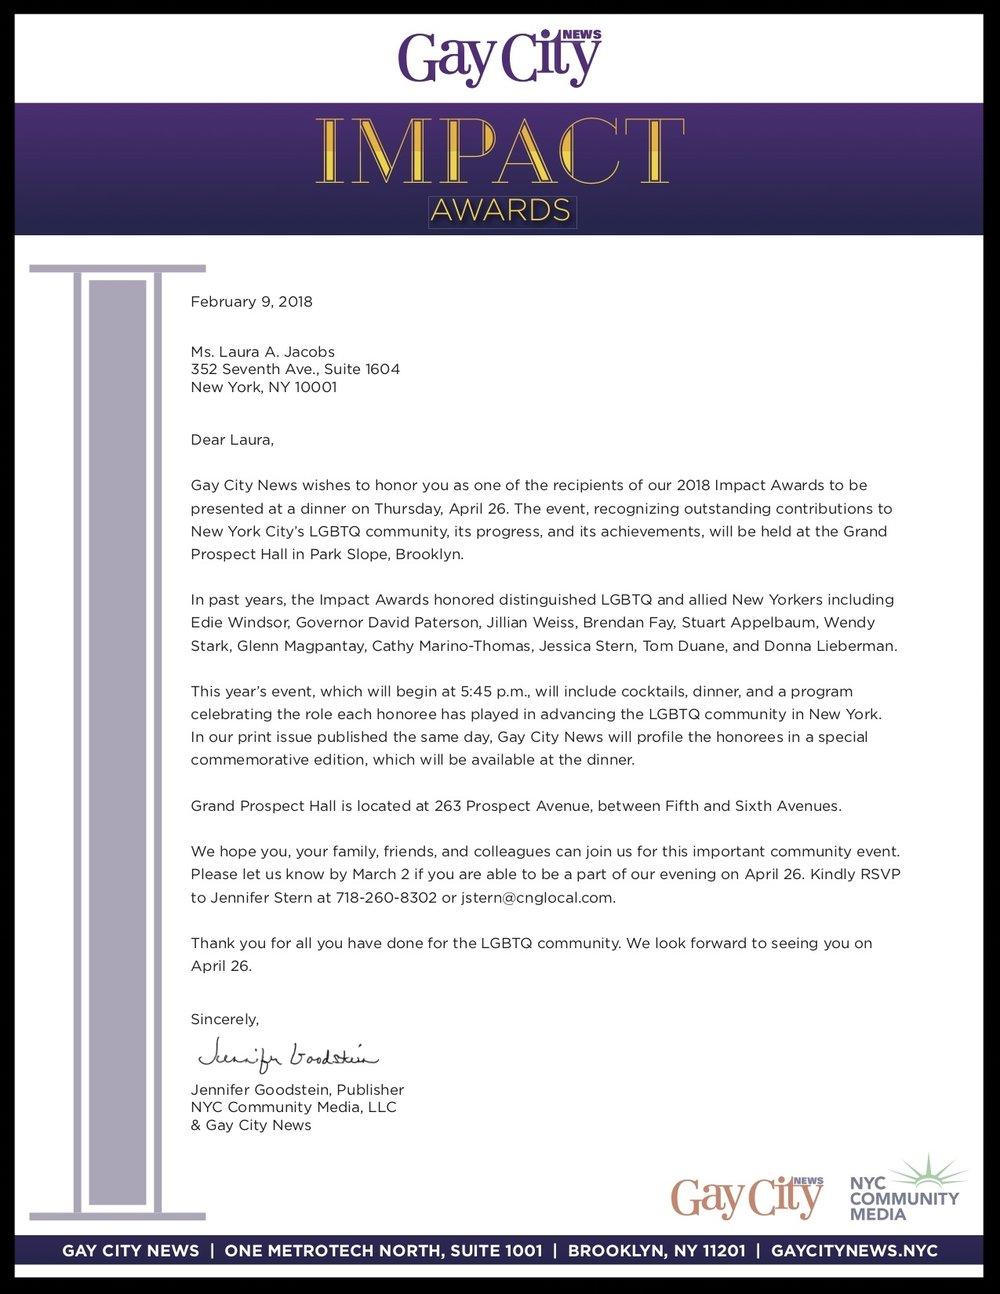 GCN 2018 ImpactAwards Invitation - Laura A. Jacobs.jpg